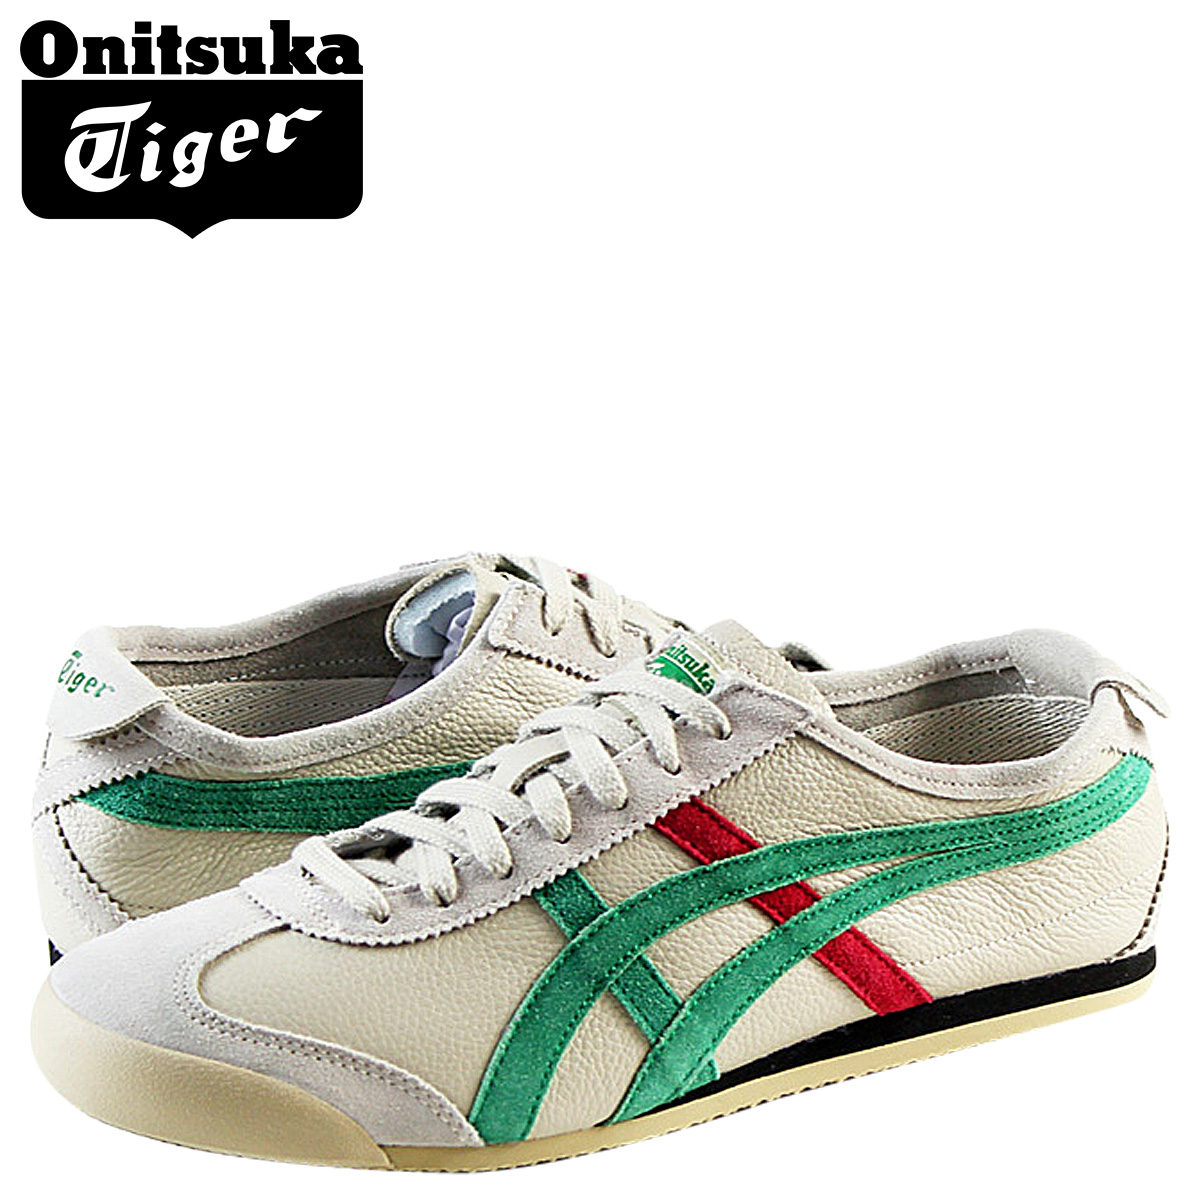 competitive price 022d7 e29a8 Buy asics tiger shop online cheap